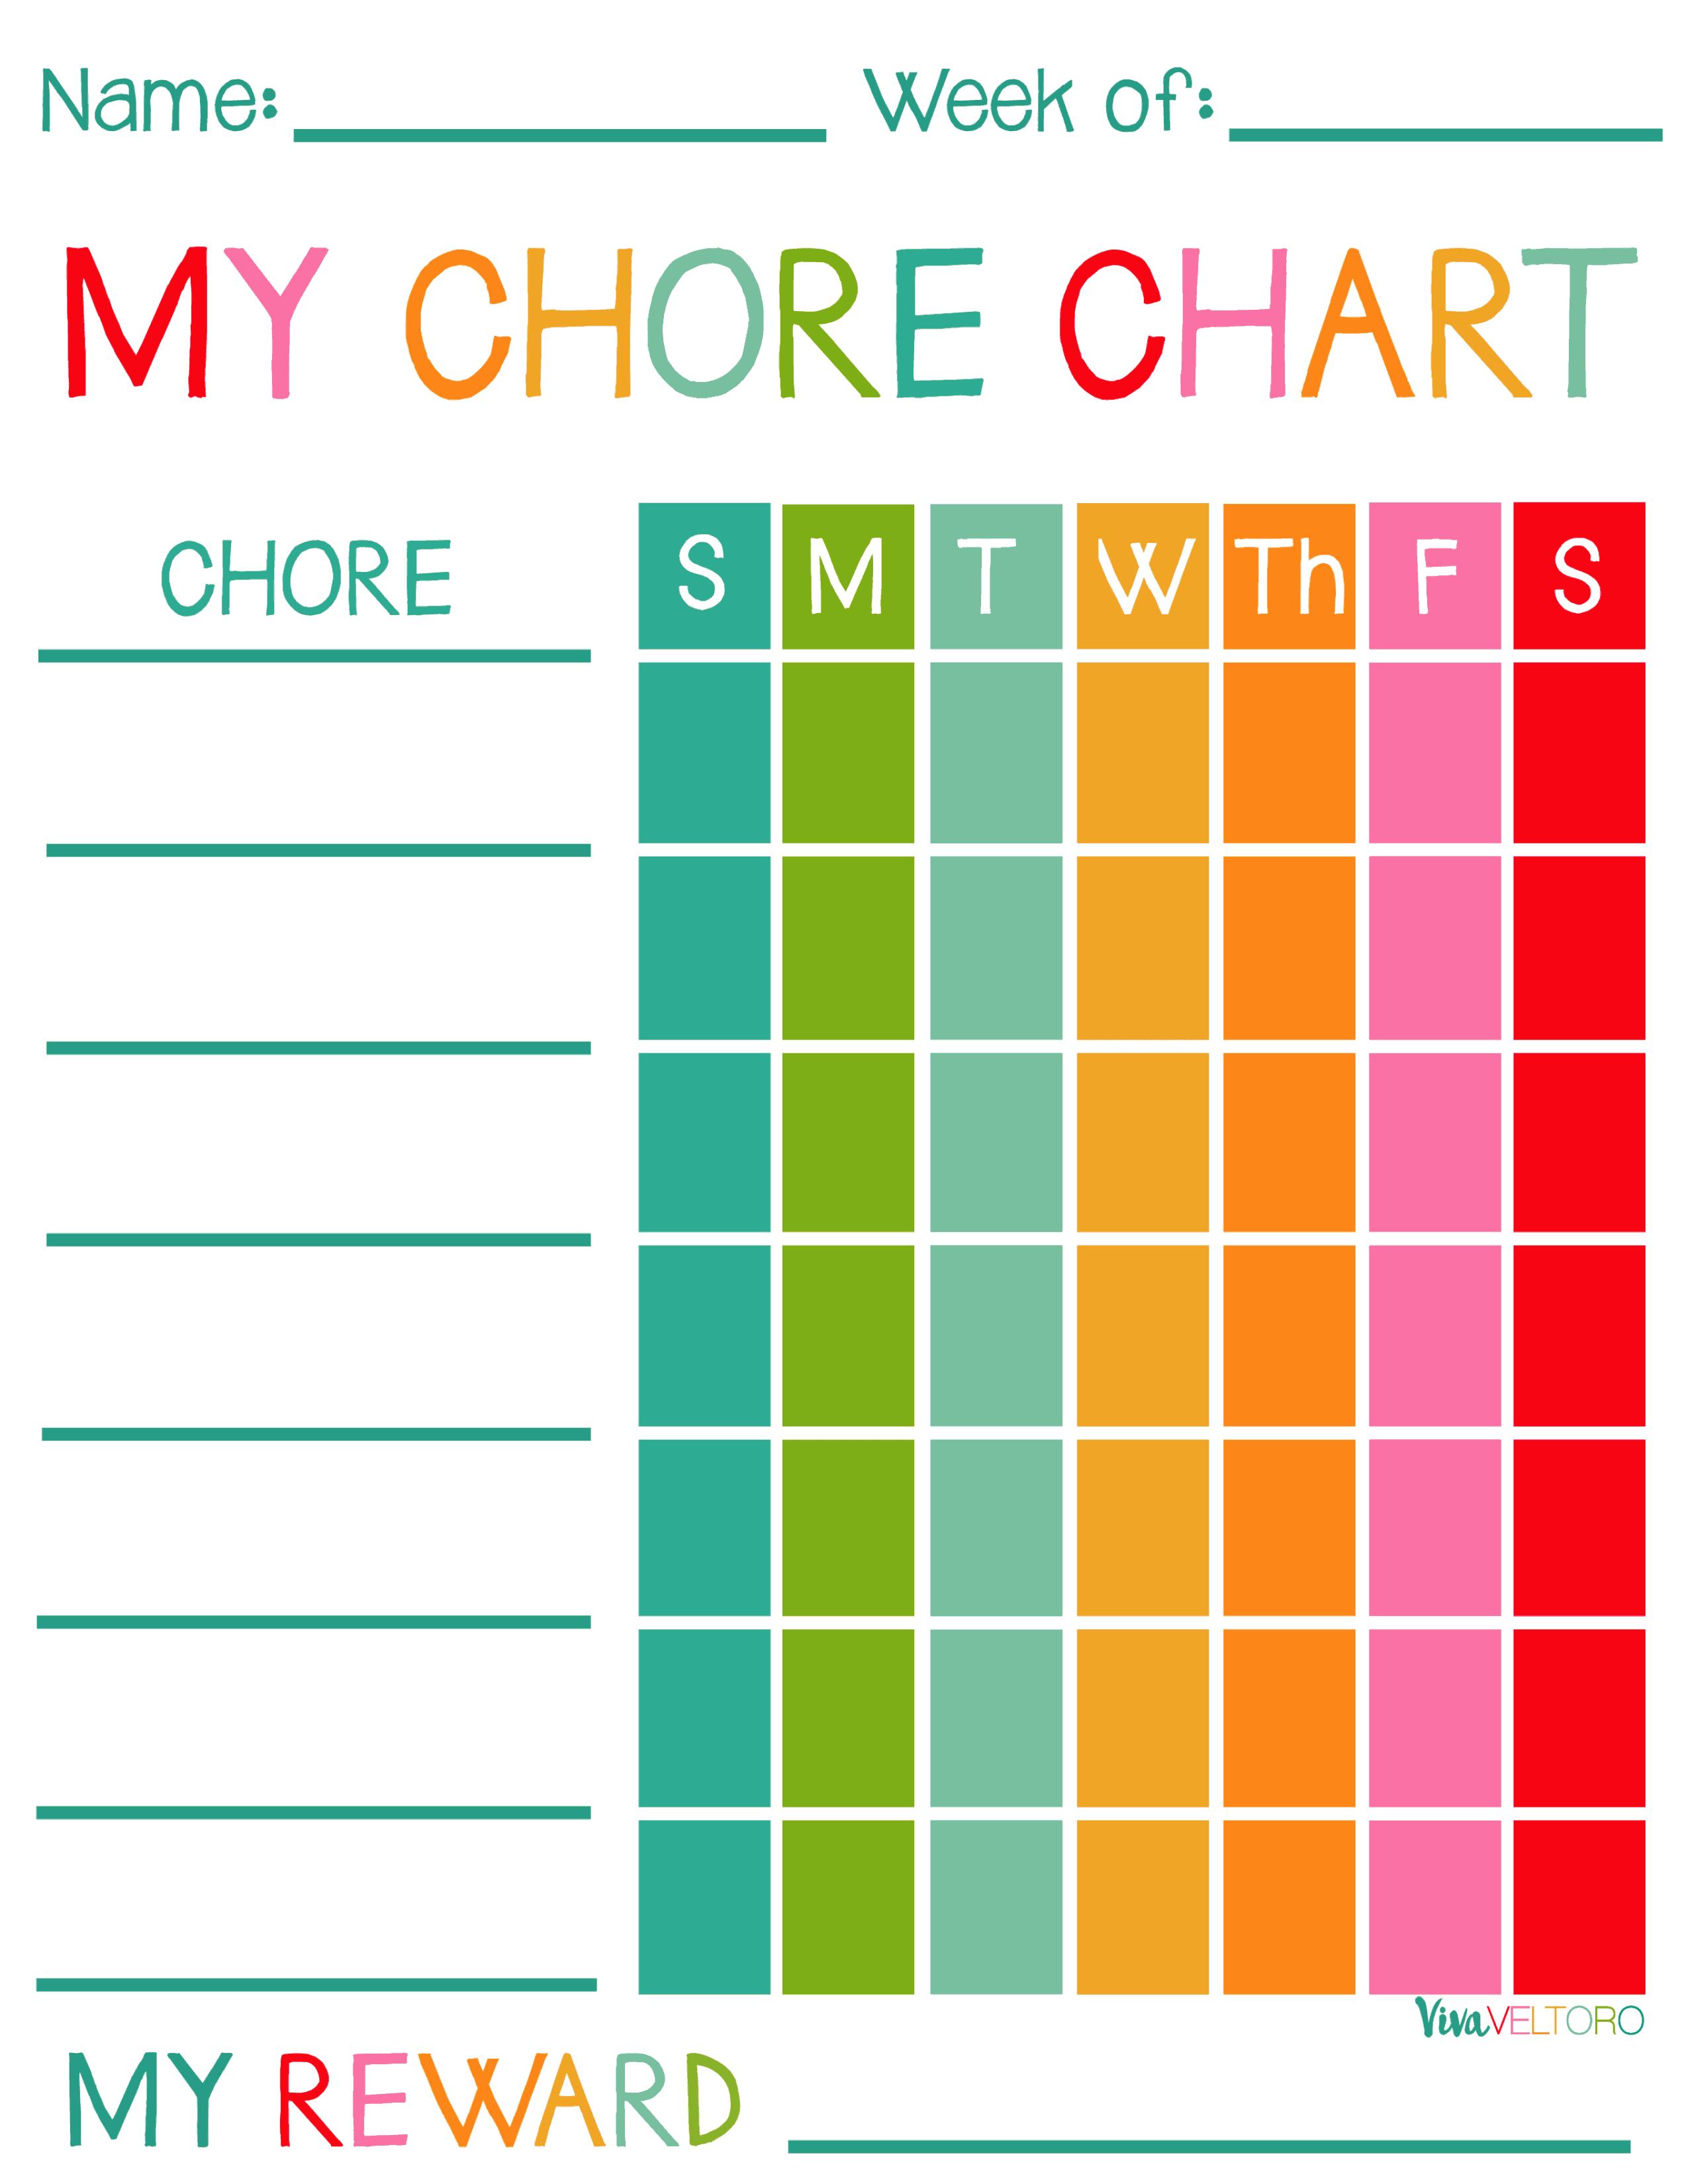 Free Printable Chore Charts For Kids! - Viva Veltoro - Free Printable Toddler Chore Chart